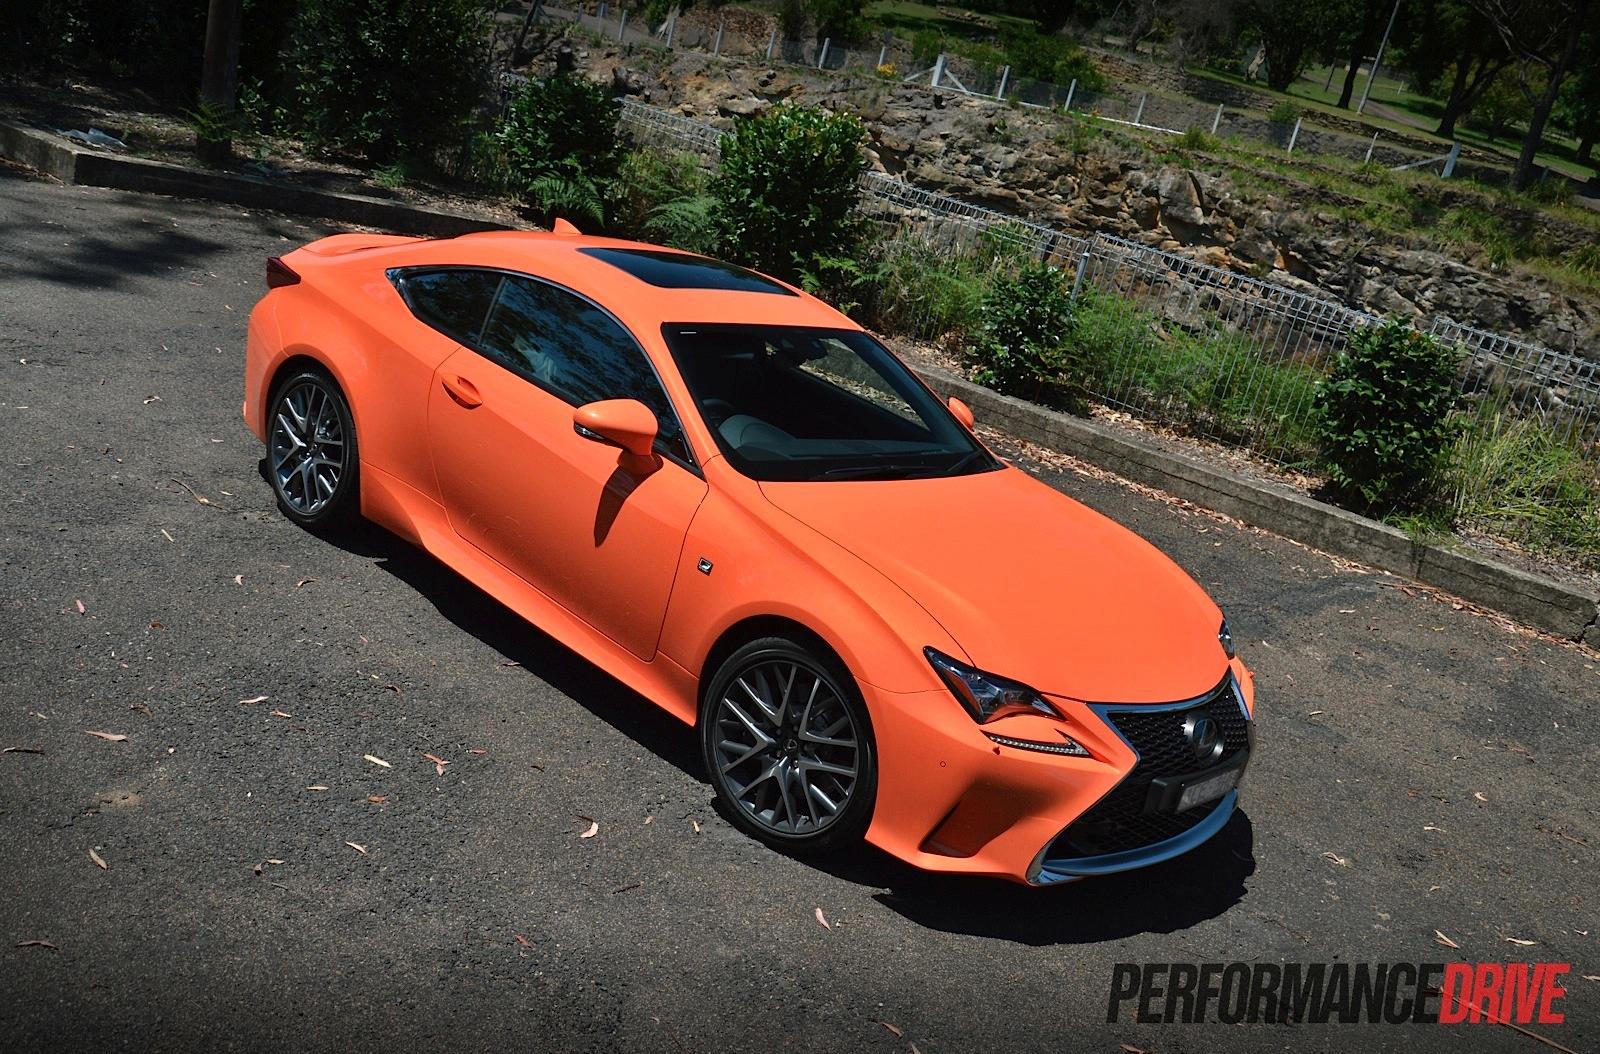 2015 Lexus RC 350 F Sport review (video) | PerformanceDrive